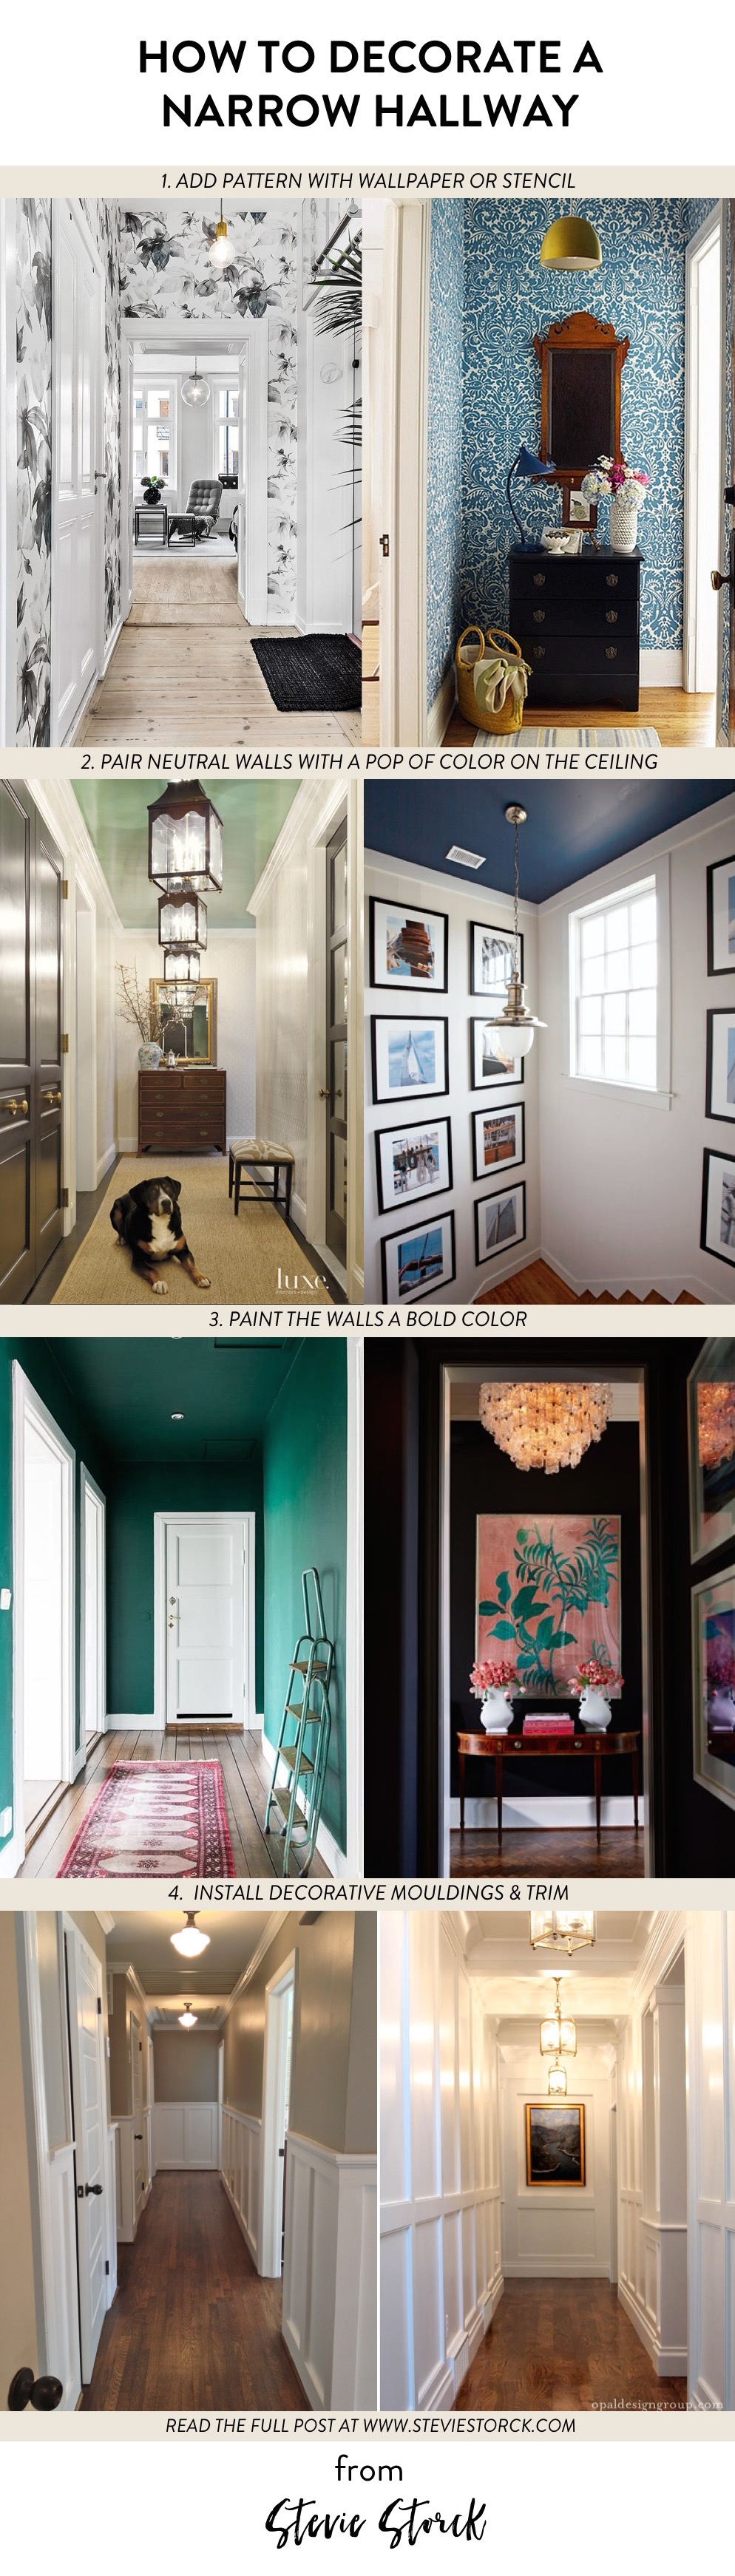 Decorating A Narrow Hallway Stevie Storck Design Co